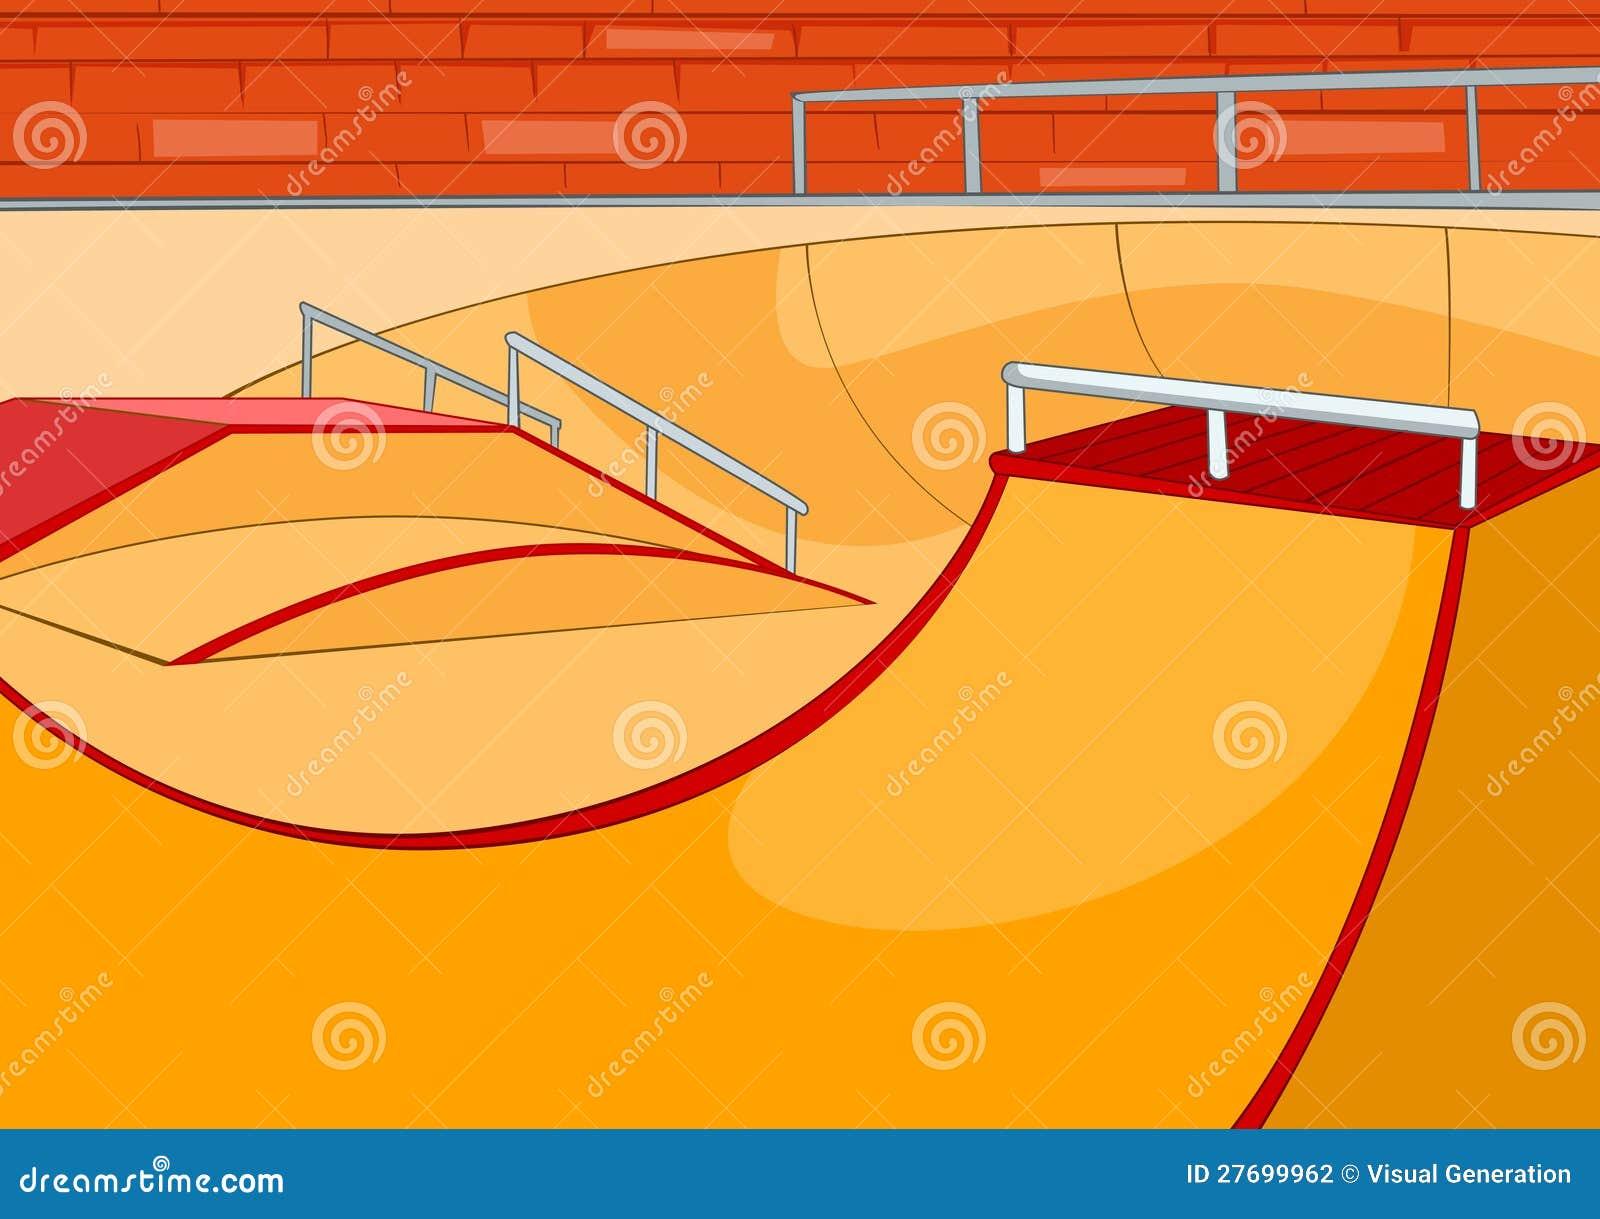 Skate Ramp Stock Photography Image 27699962